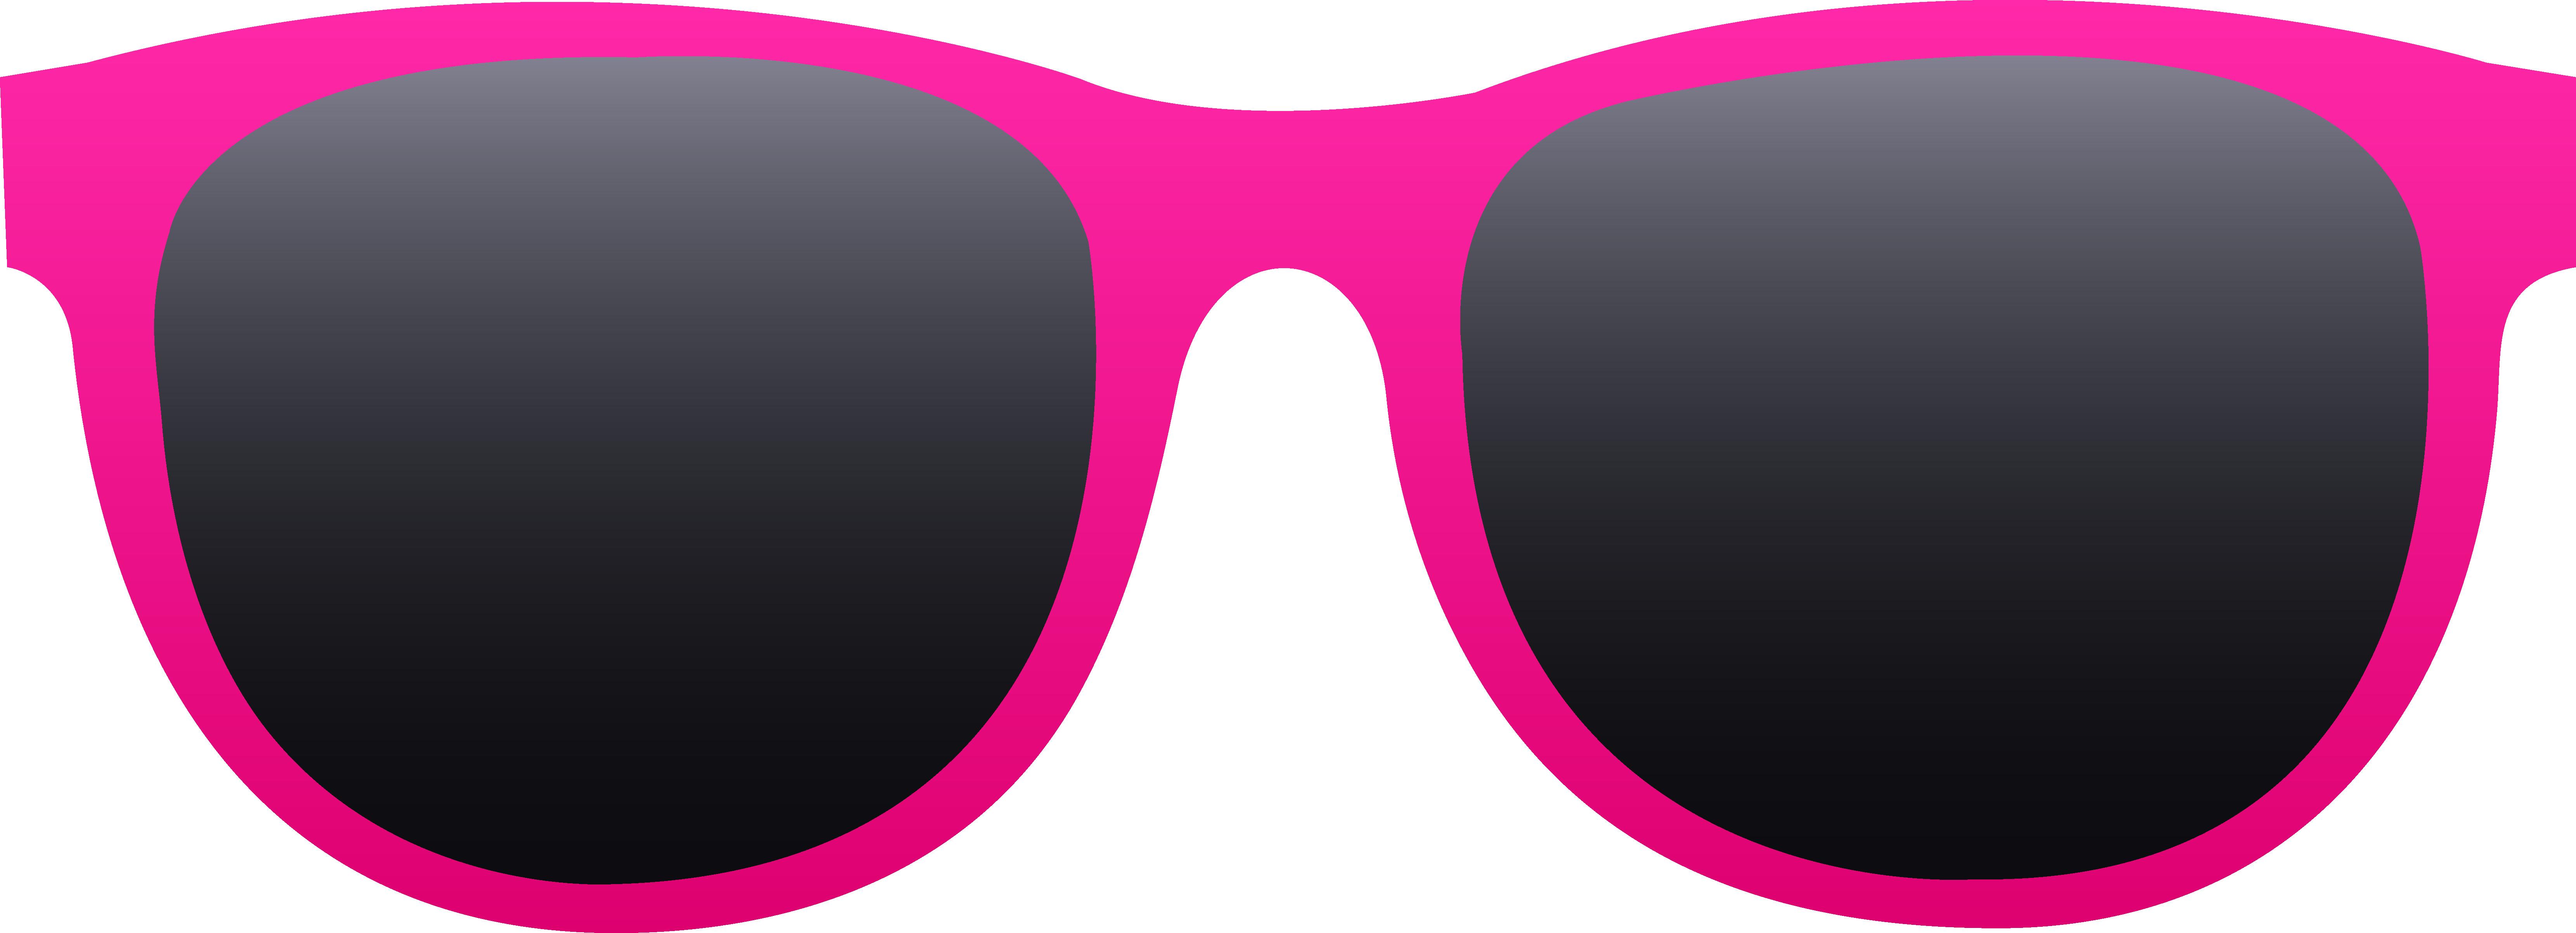 Sunglasses Clipart at GetDrawings.com.